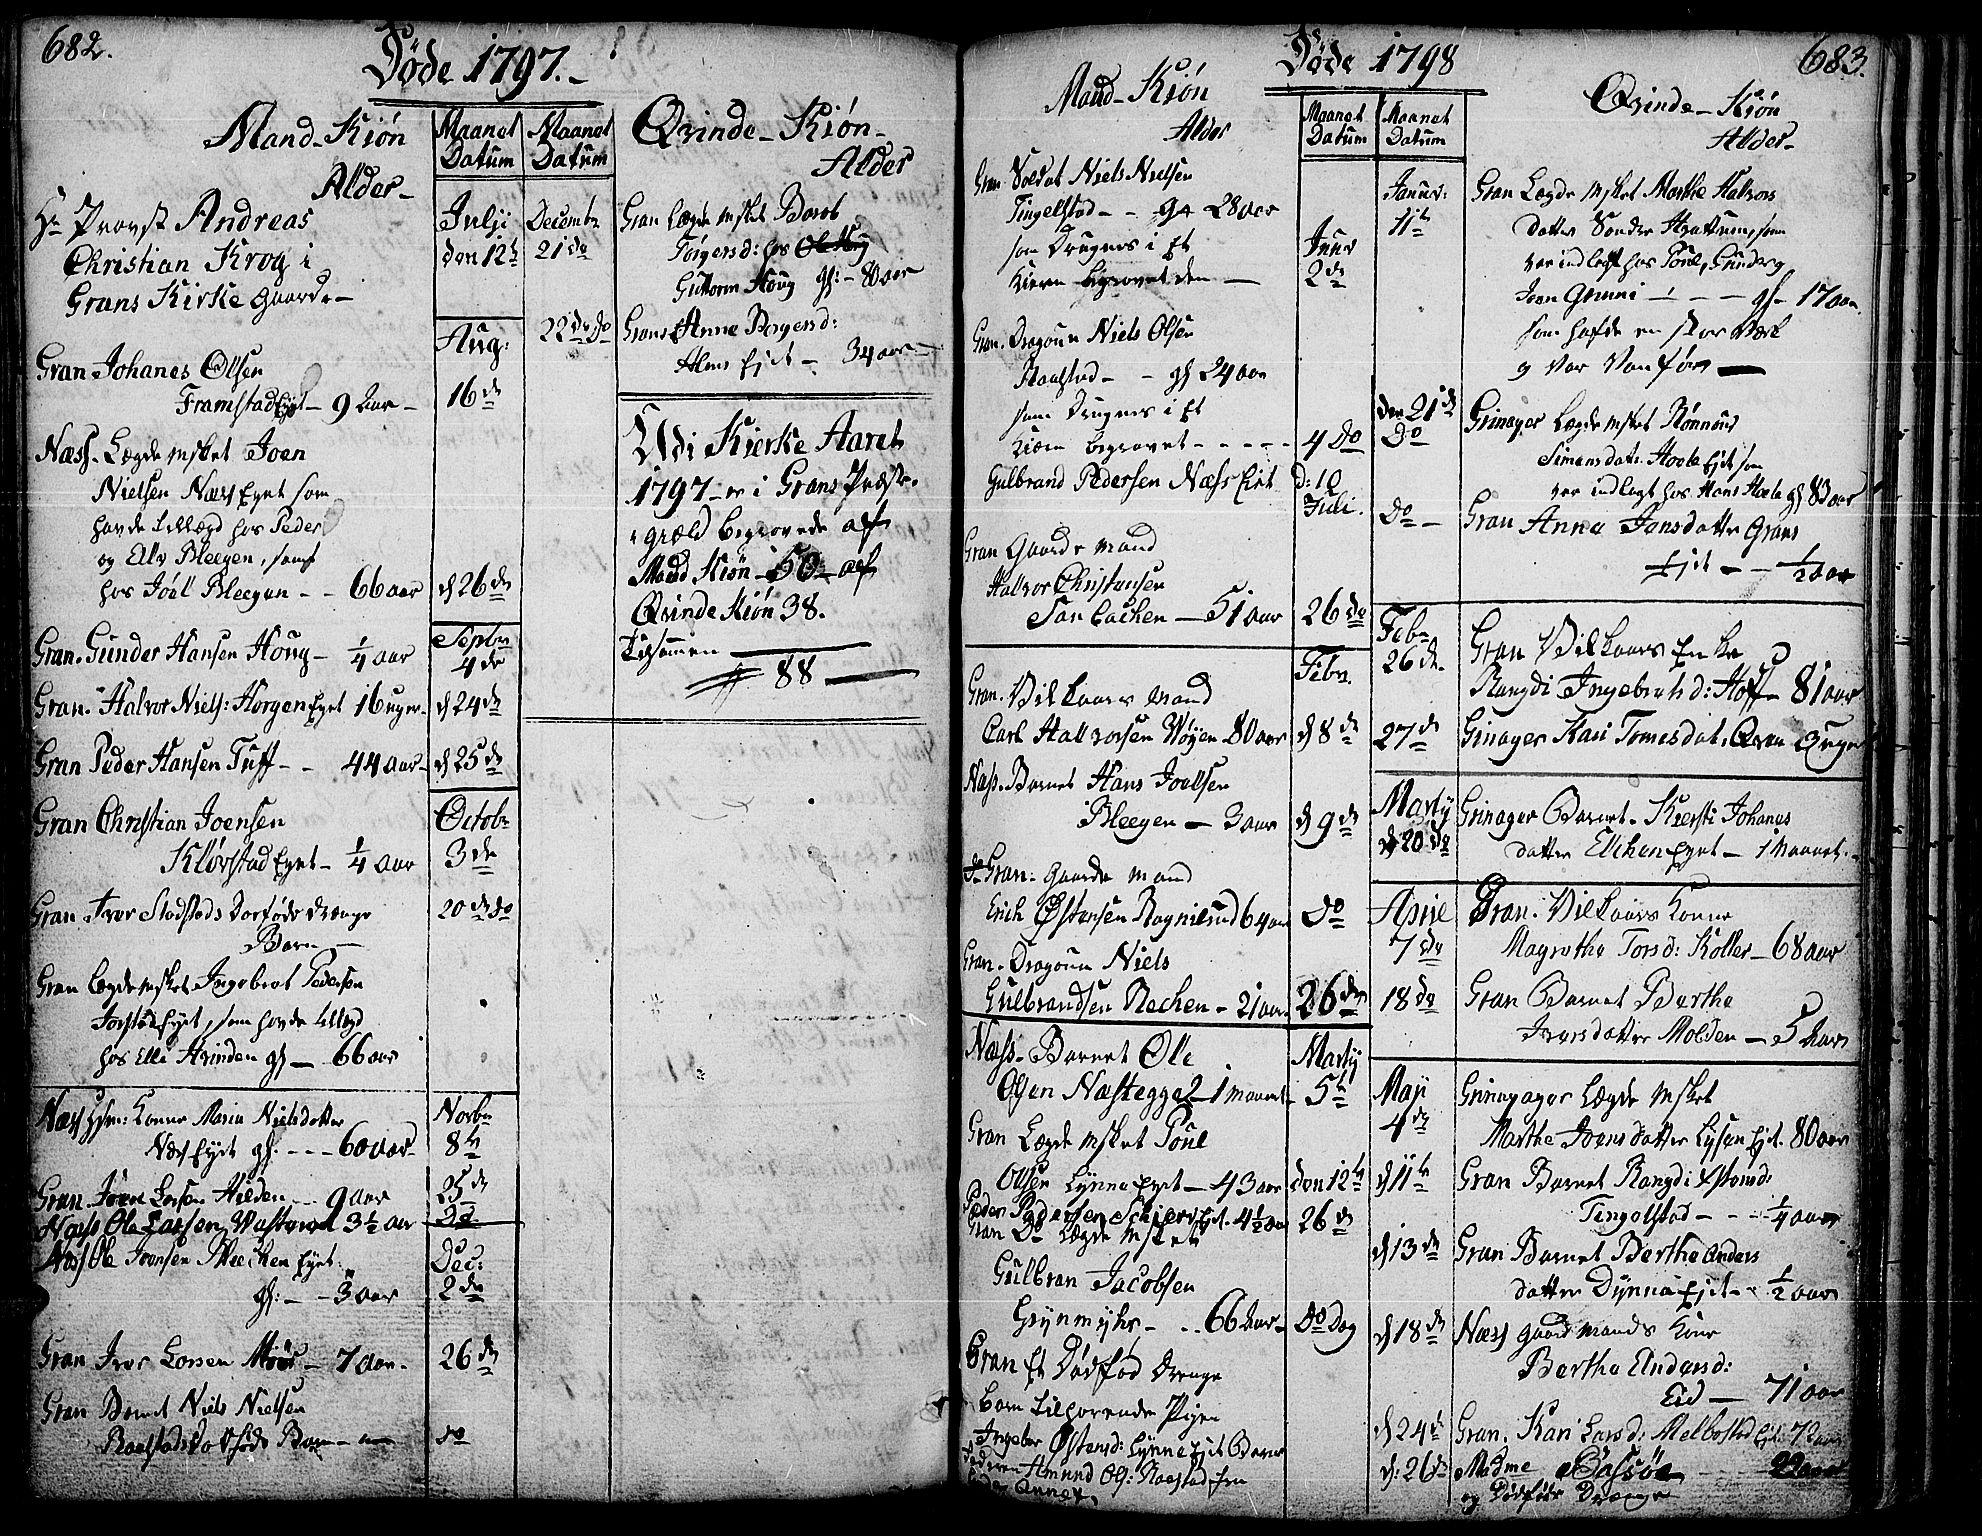 SAH, Gran prestekontor, Ministerialbok nr. 6, 1787-1824, s. 682-683